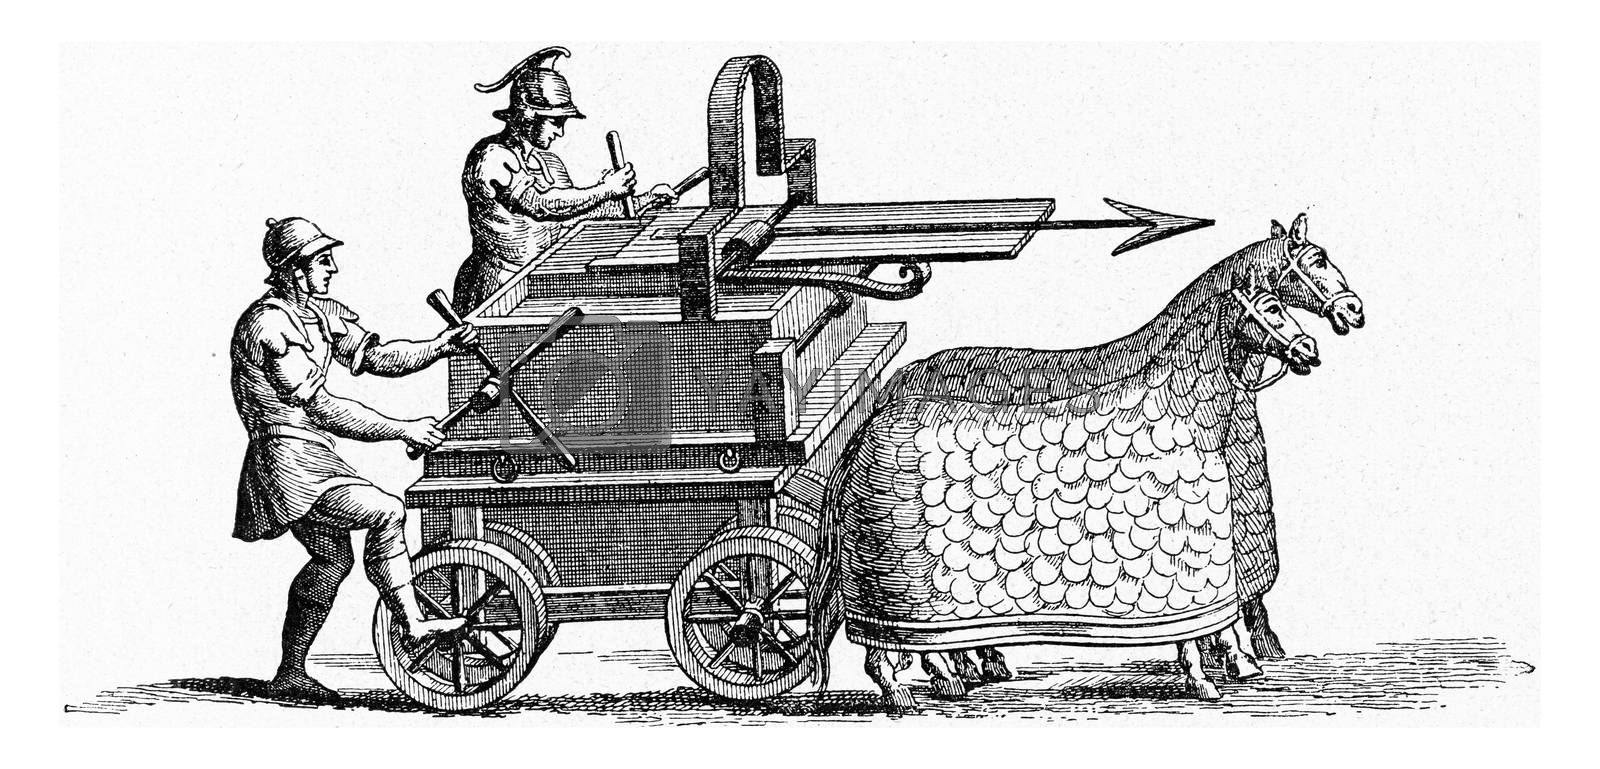 Royalty free image of Ancient Roman machine throwing javelins, vintage engraving. by Morphart